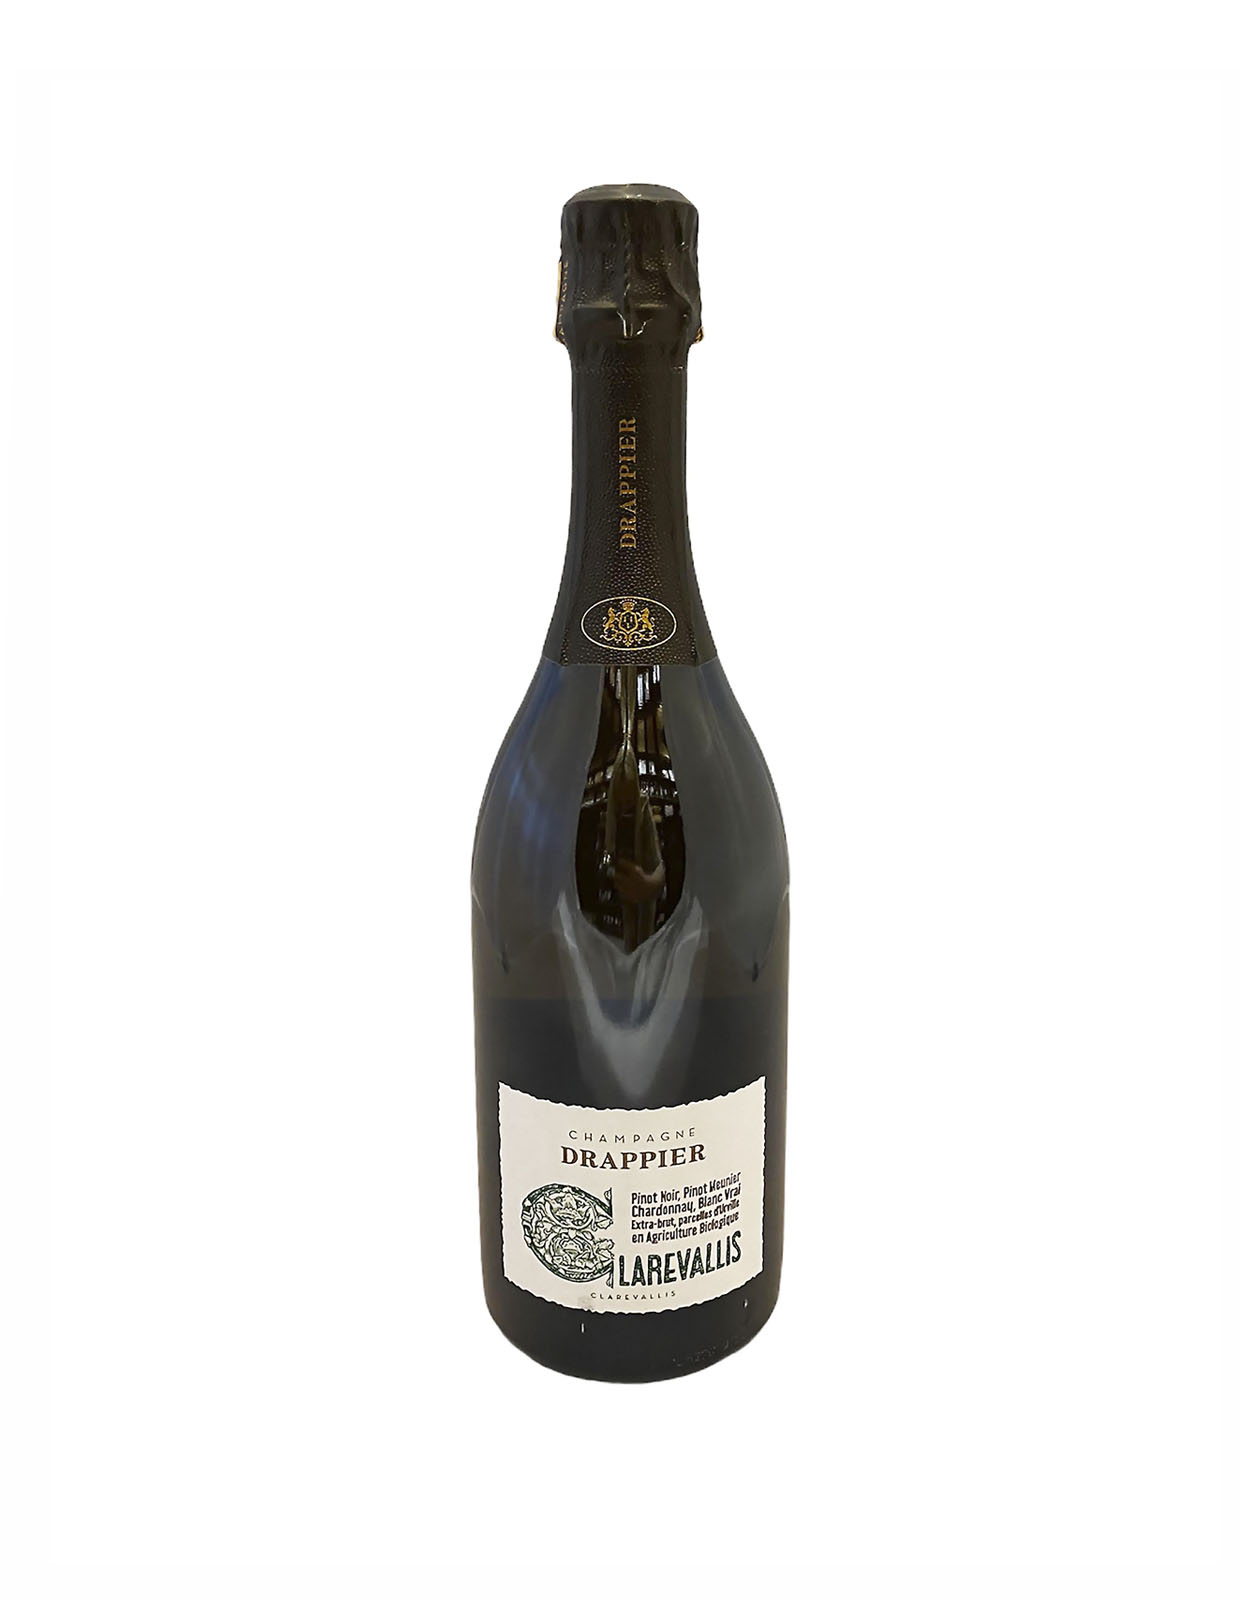 Clarevallis Extra Brut Champagne Francúzsko, Bublinky, bublinkové víno z talianska vinotéka Bratislava Petržalka Slnecnice, Sunnywines, rozvoz vina, winebar